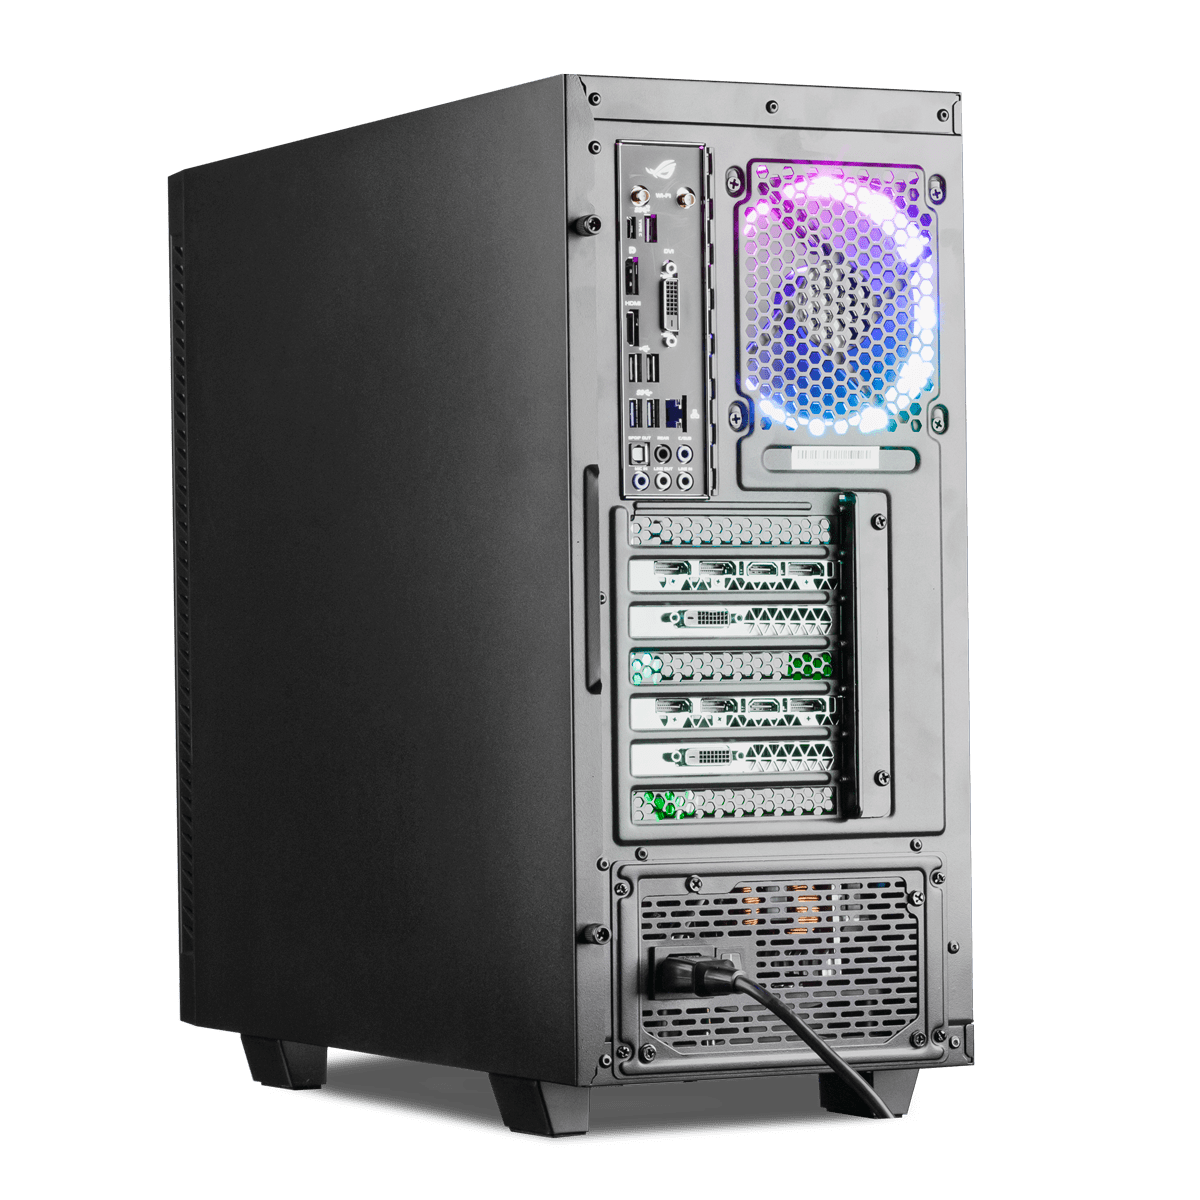 AMD Ryzen 7 Configurator